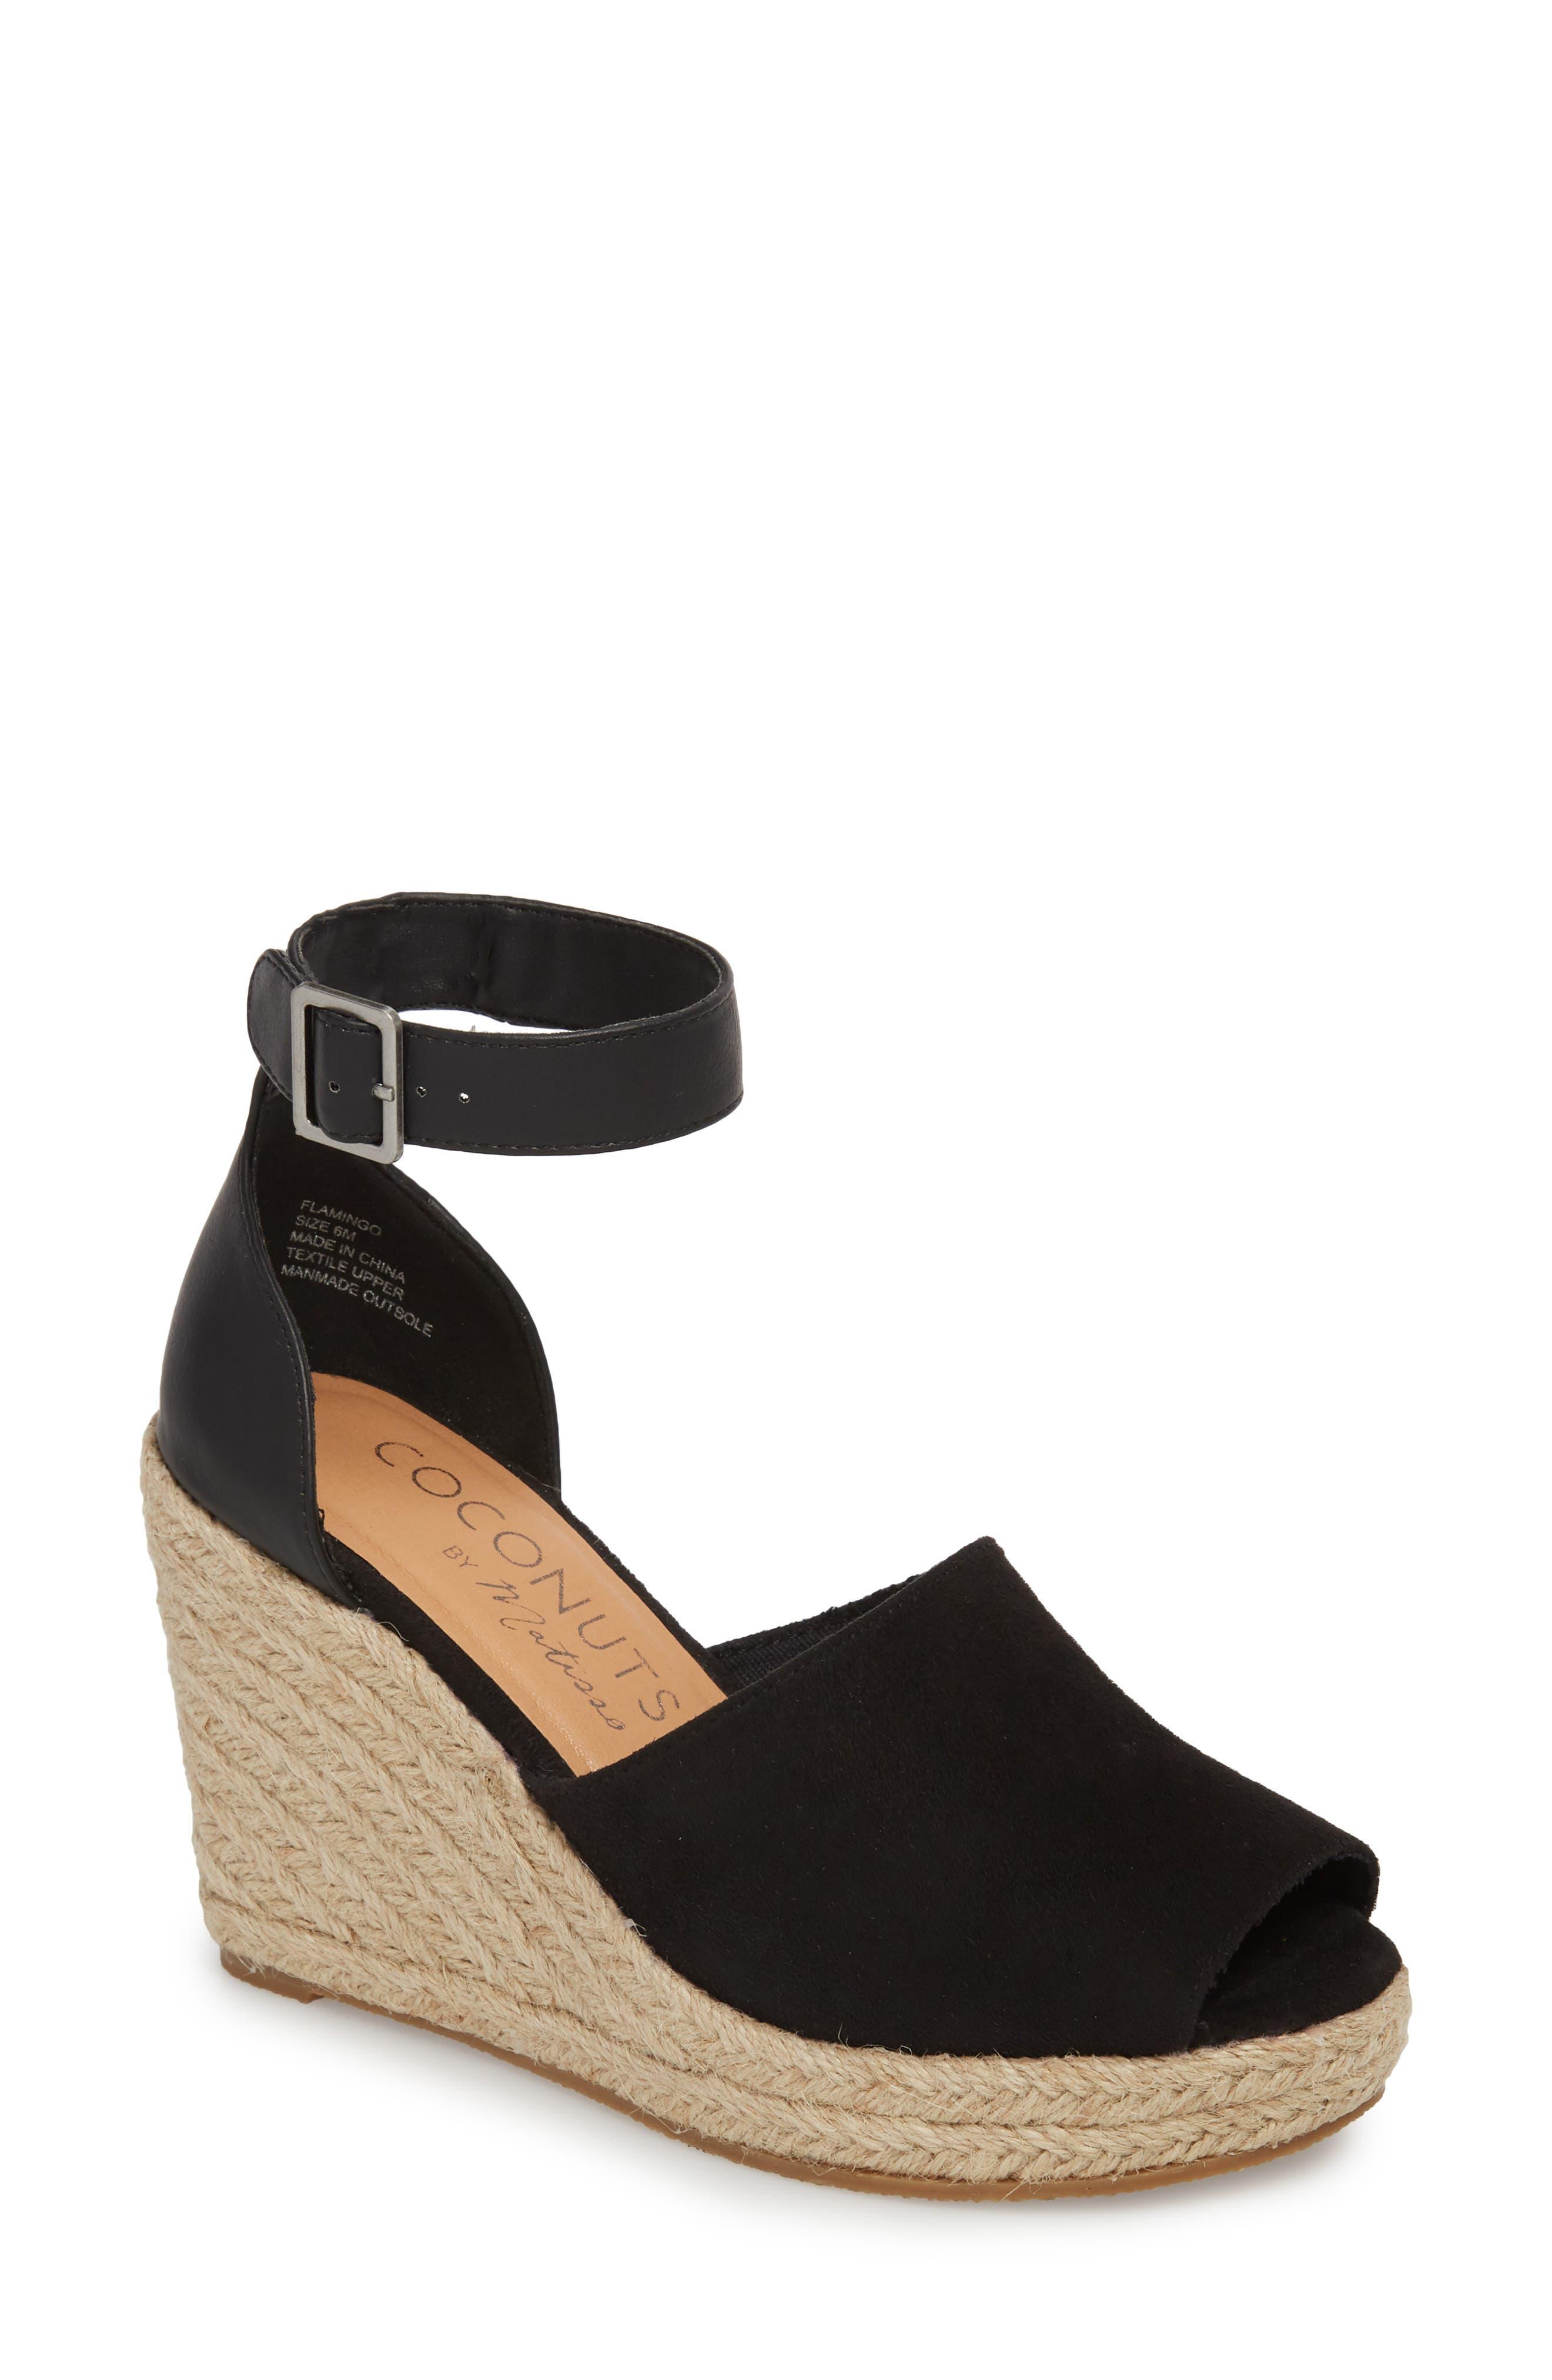 Flamingo Wedge Sandal,                         Main,                         color, Black Suede